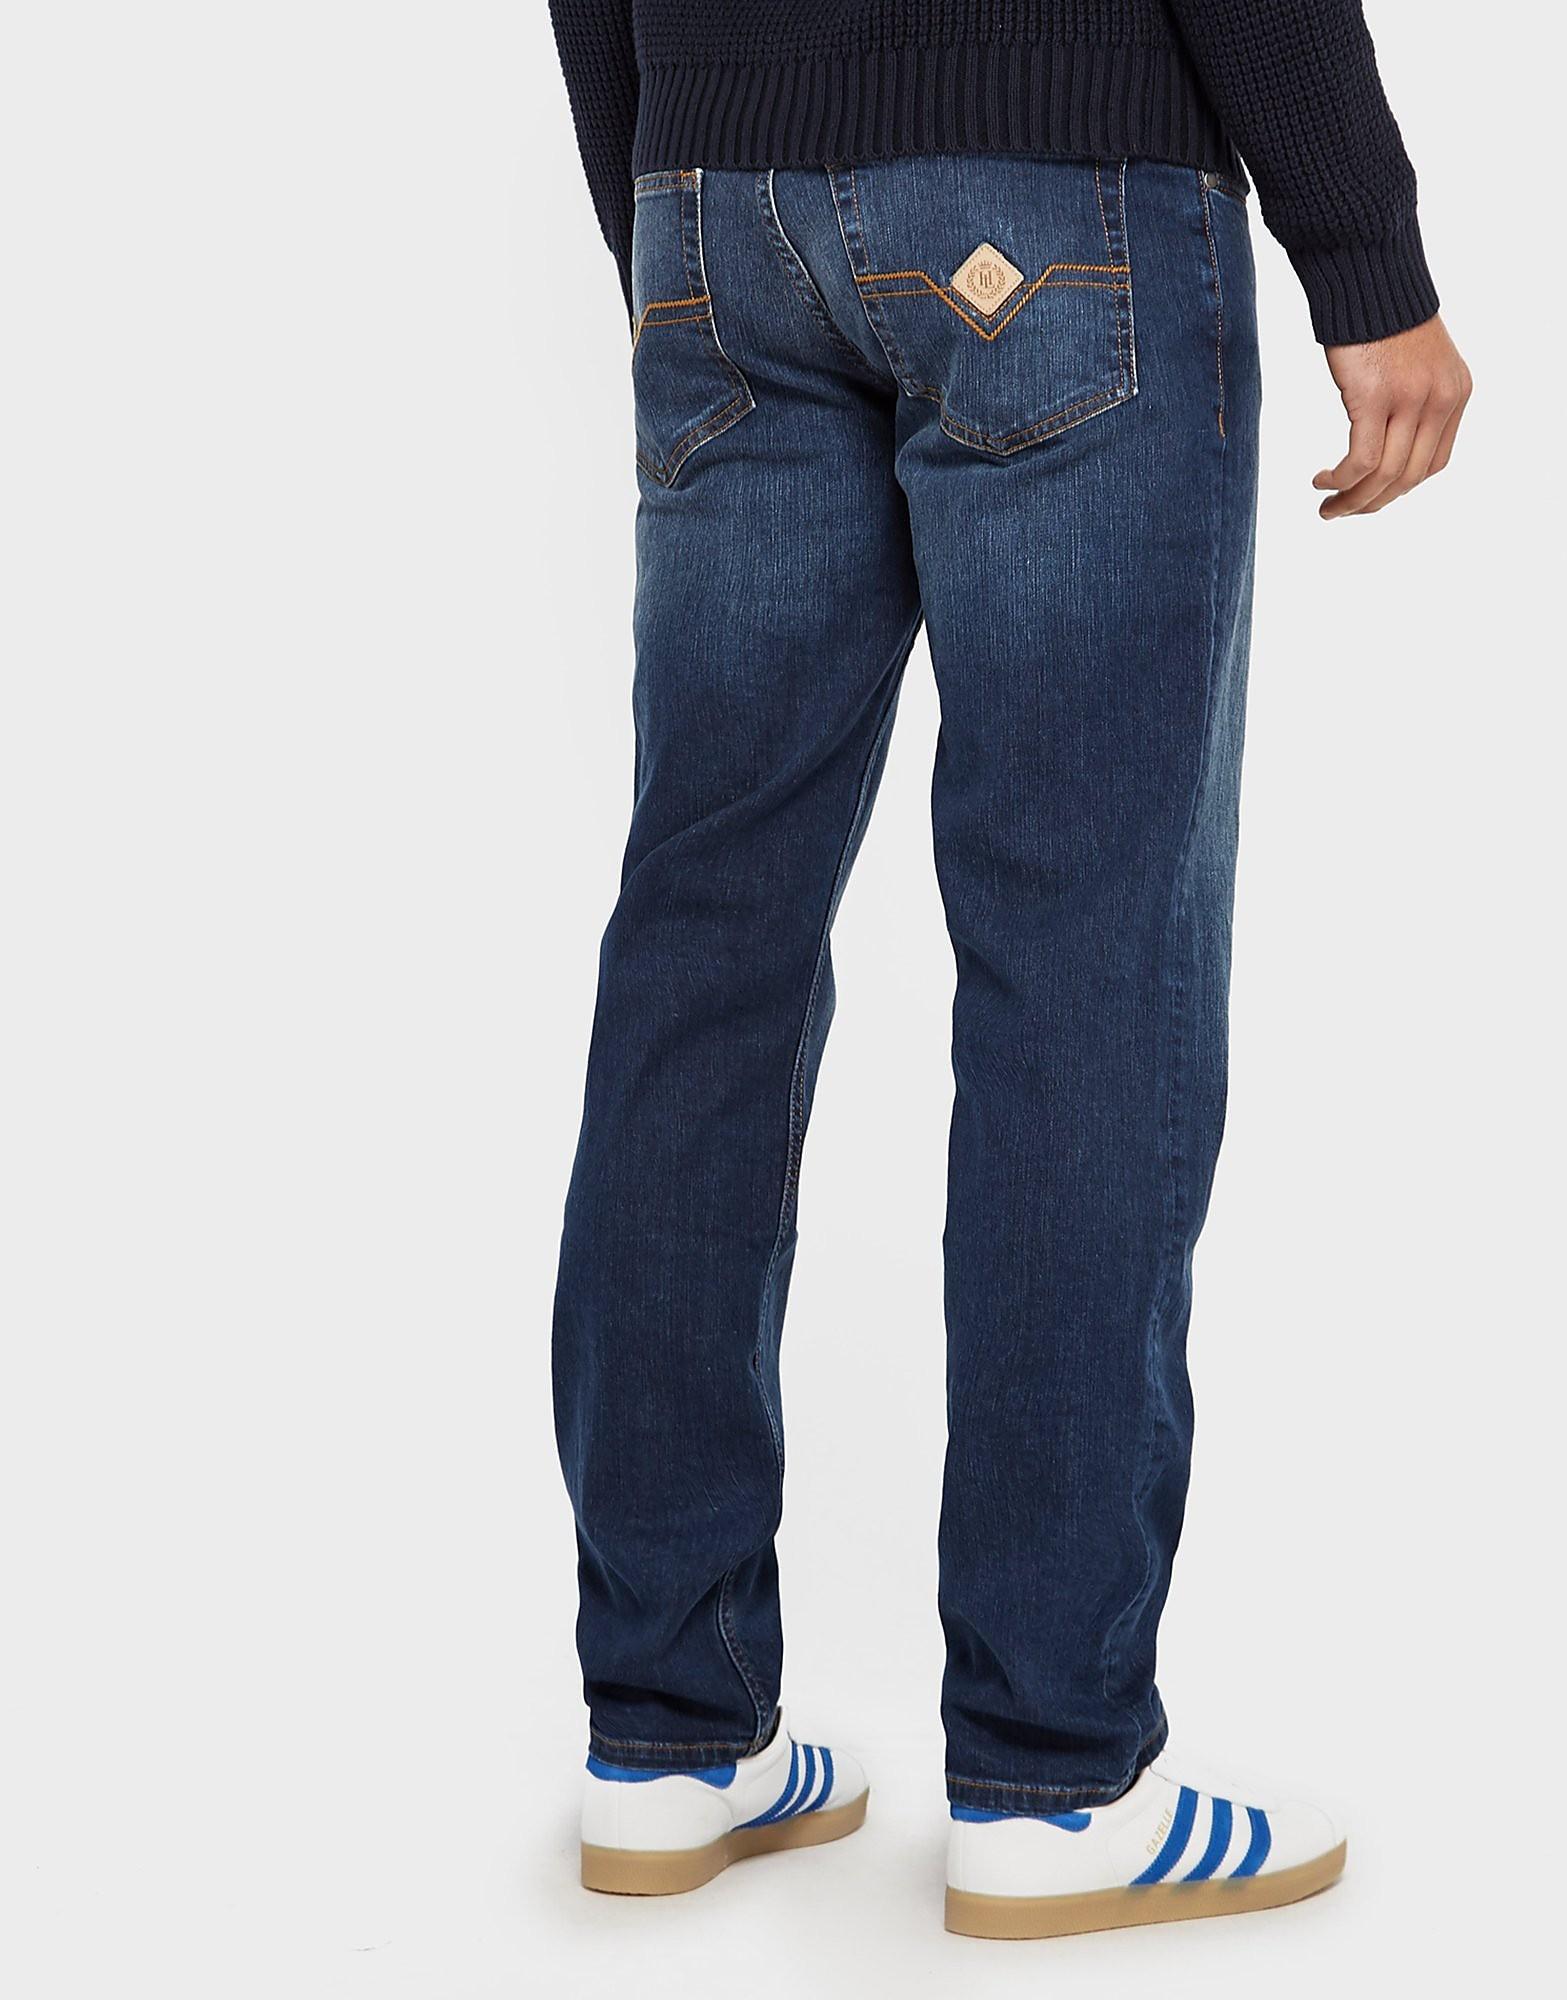 Henri Lloyd Manston Regular Leg Jean  Blue Blue